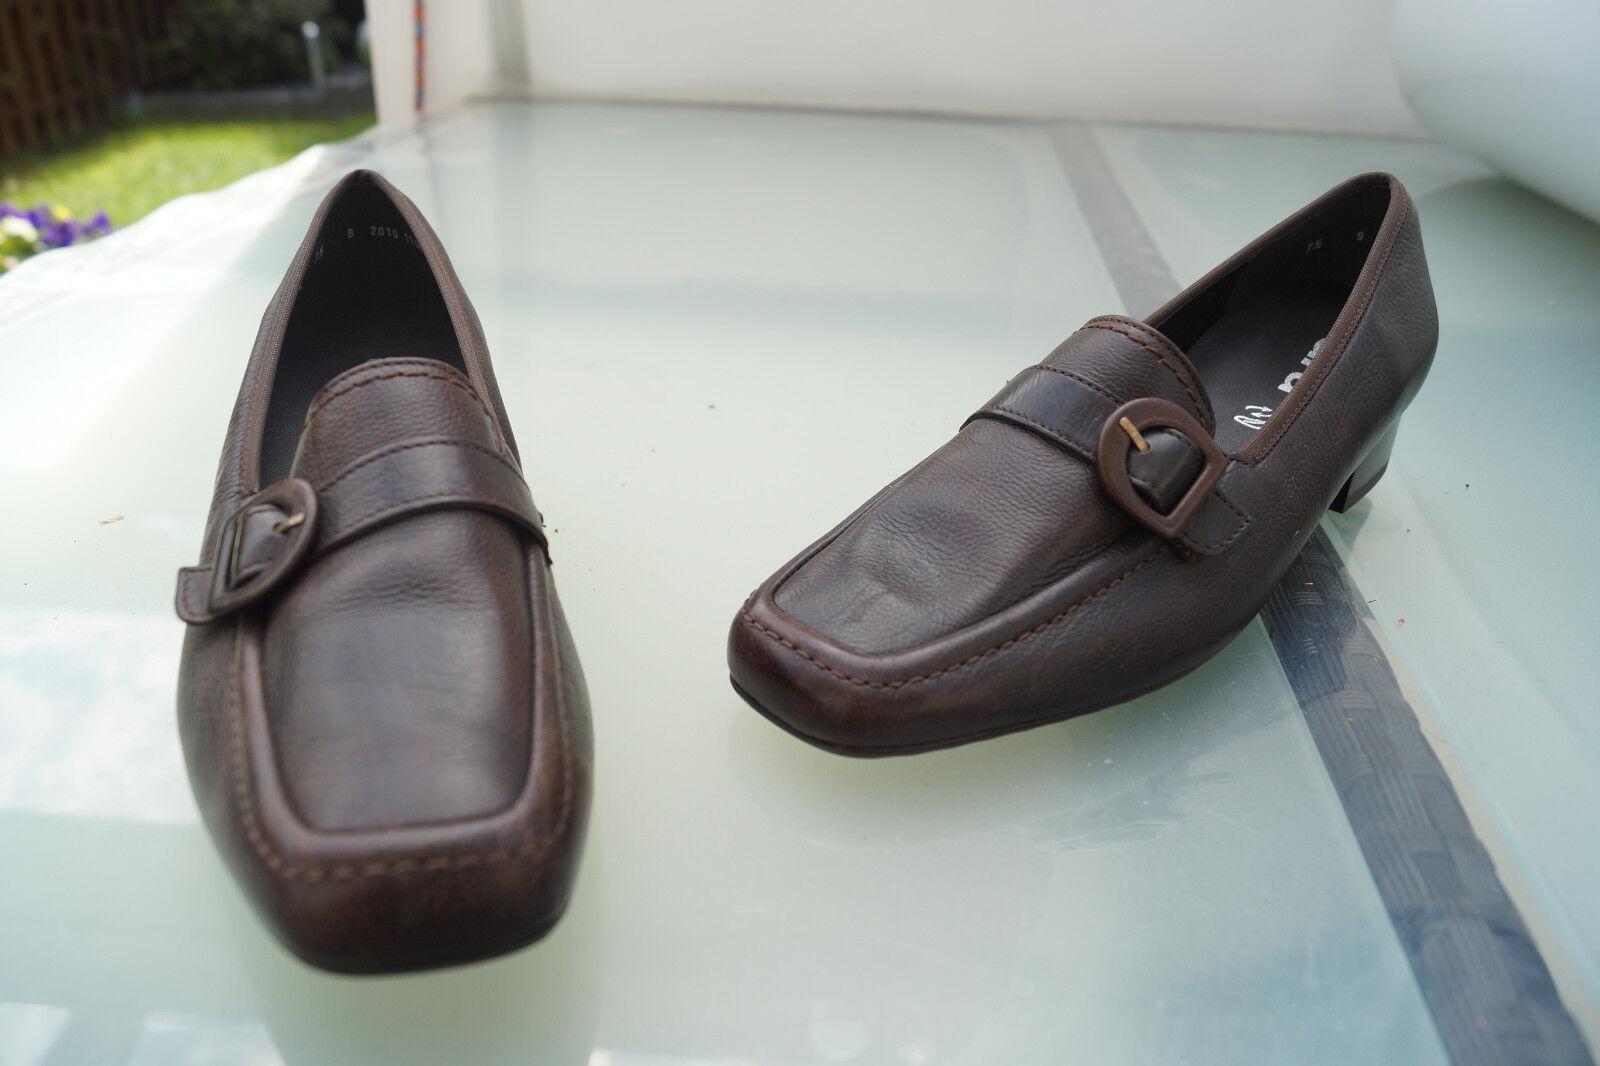 ARA Damen Comfort Schuhe Einlagen Pumps Leder bequem schick Gr.7,5H 41 braun NEU